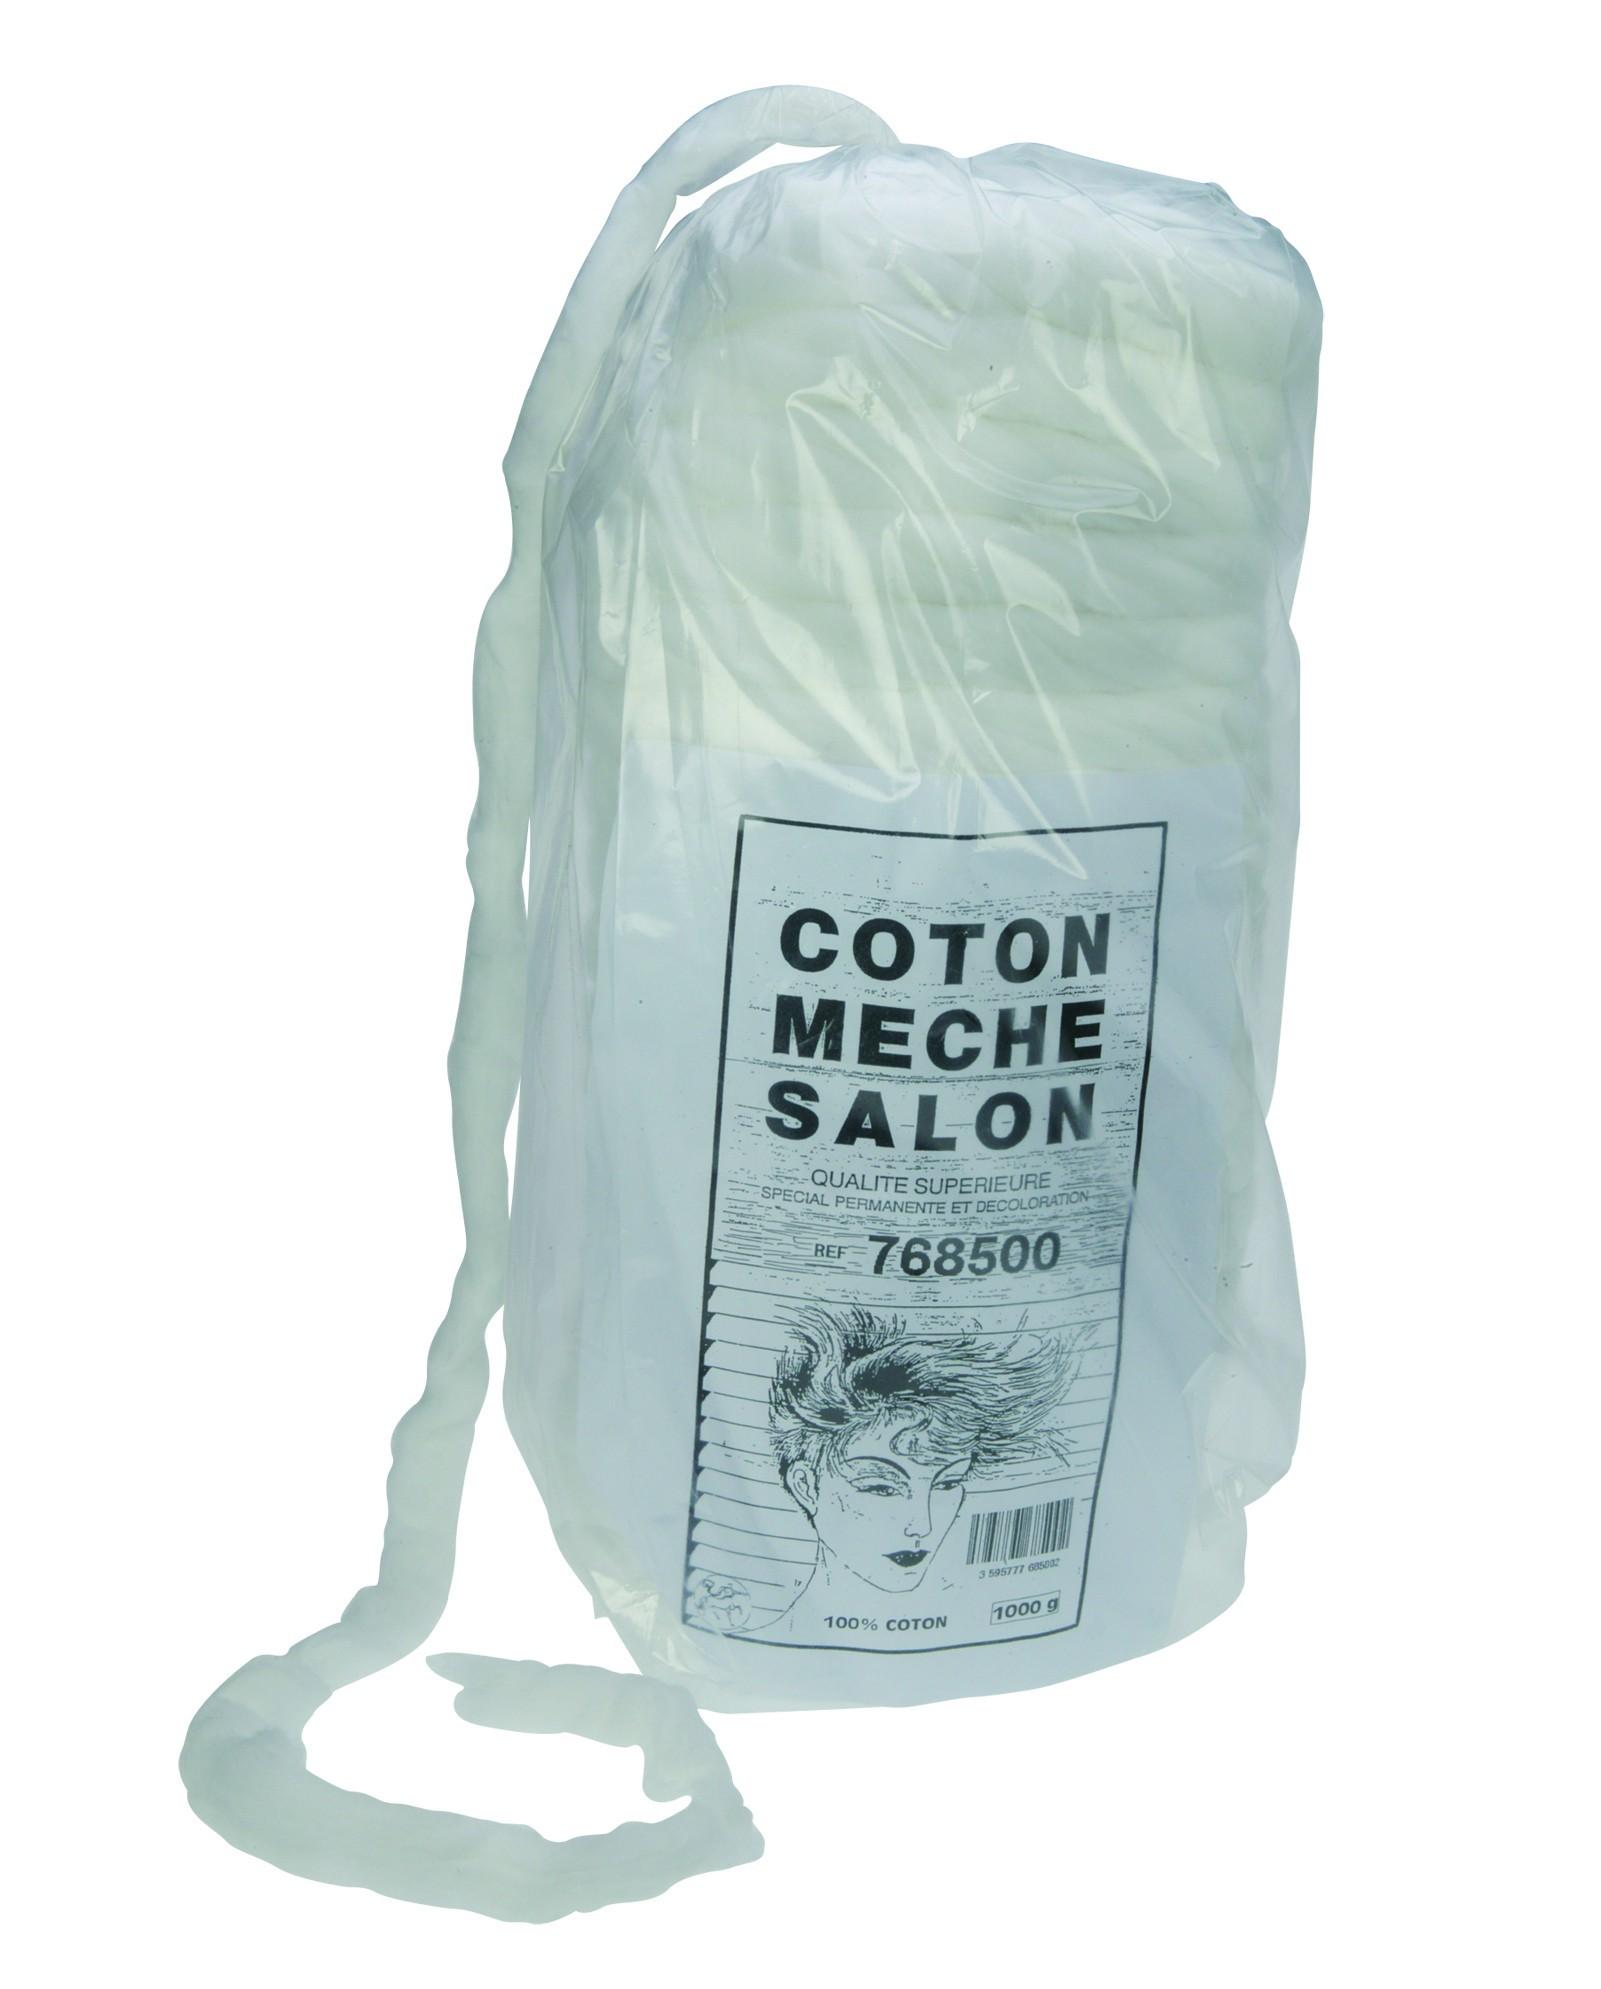 Coton Meches Salon Sac 1Kg...